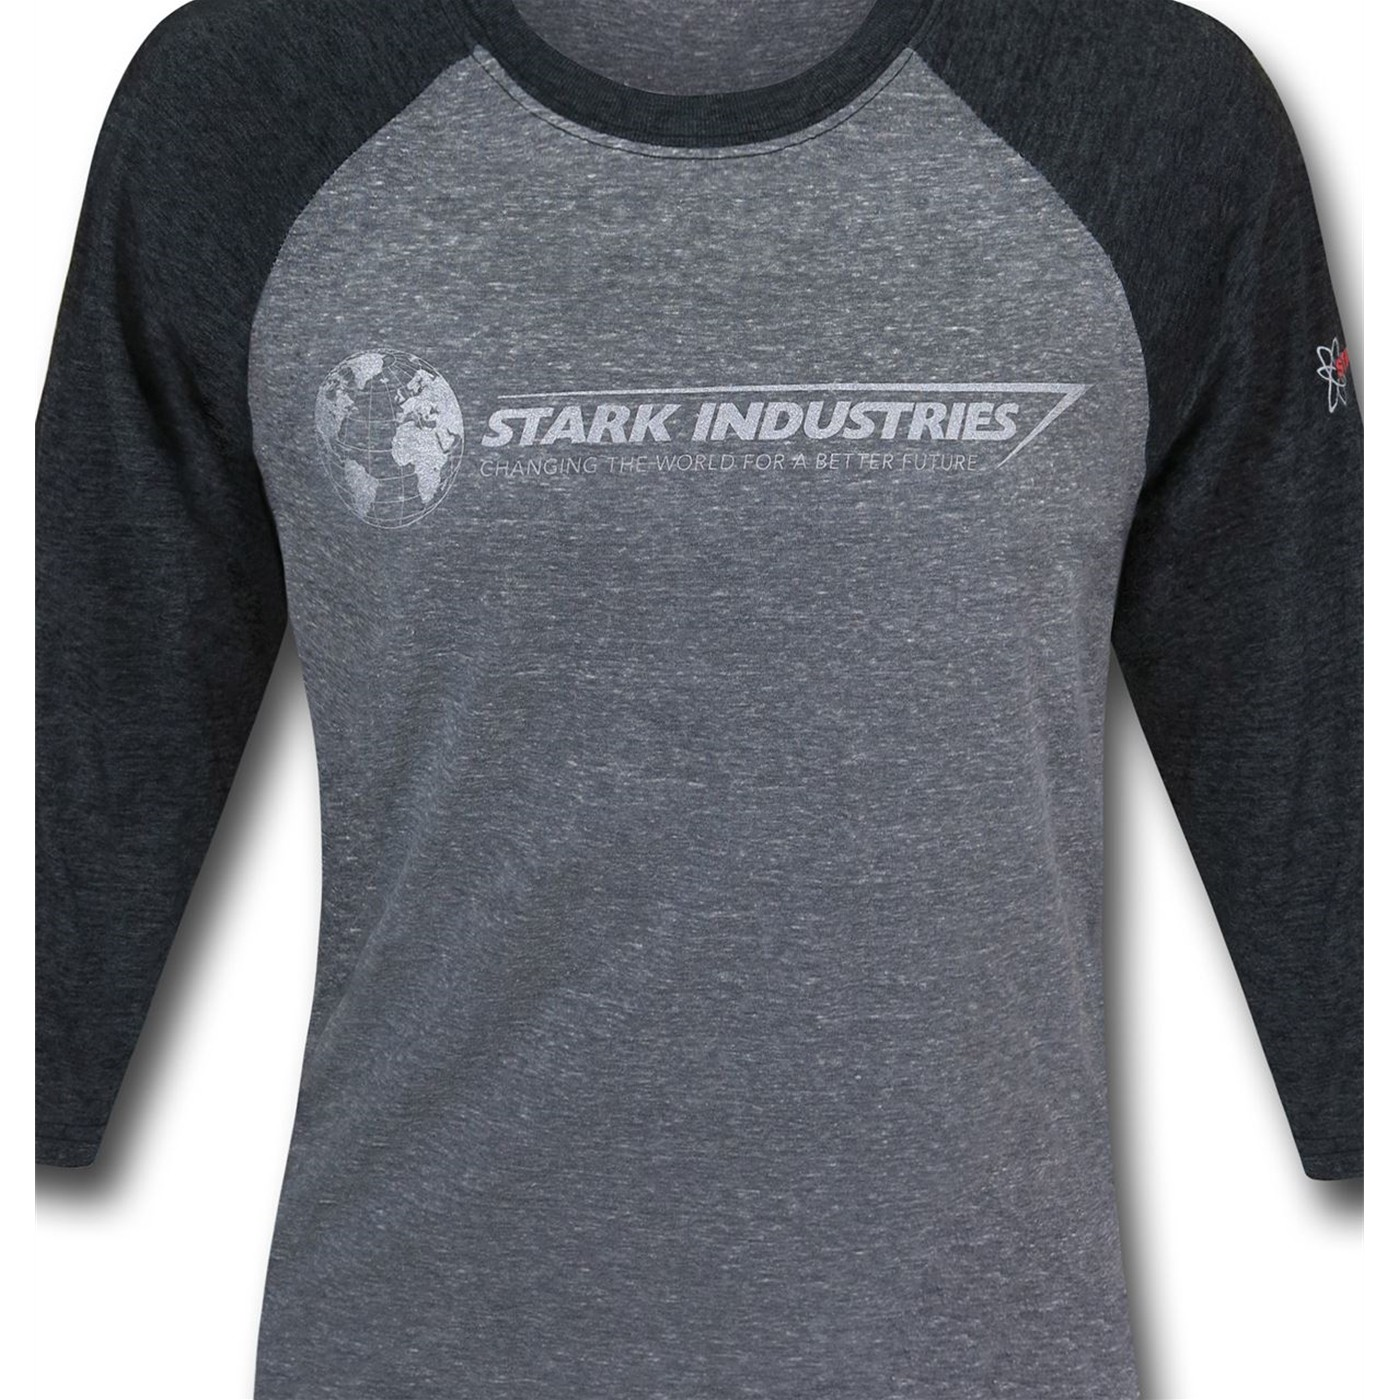 Iron Man Stark Industries Expo Men's Baseball T-Shirt